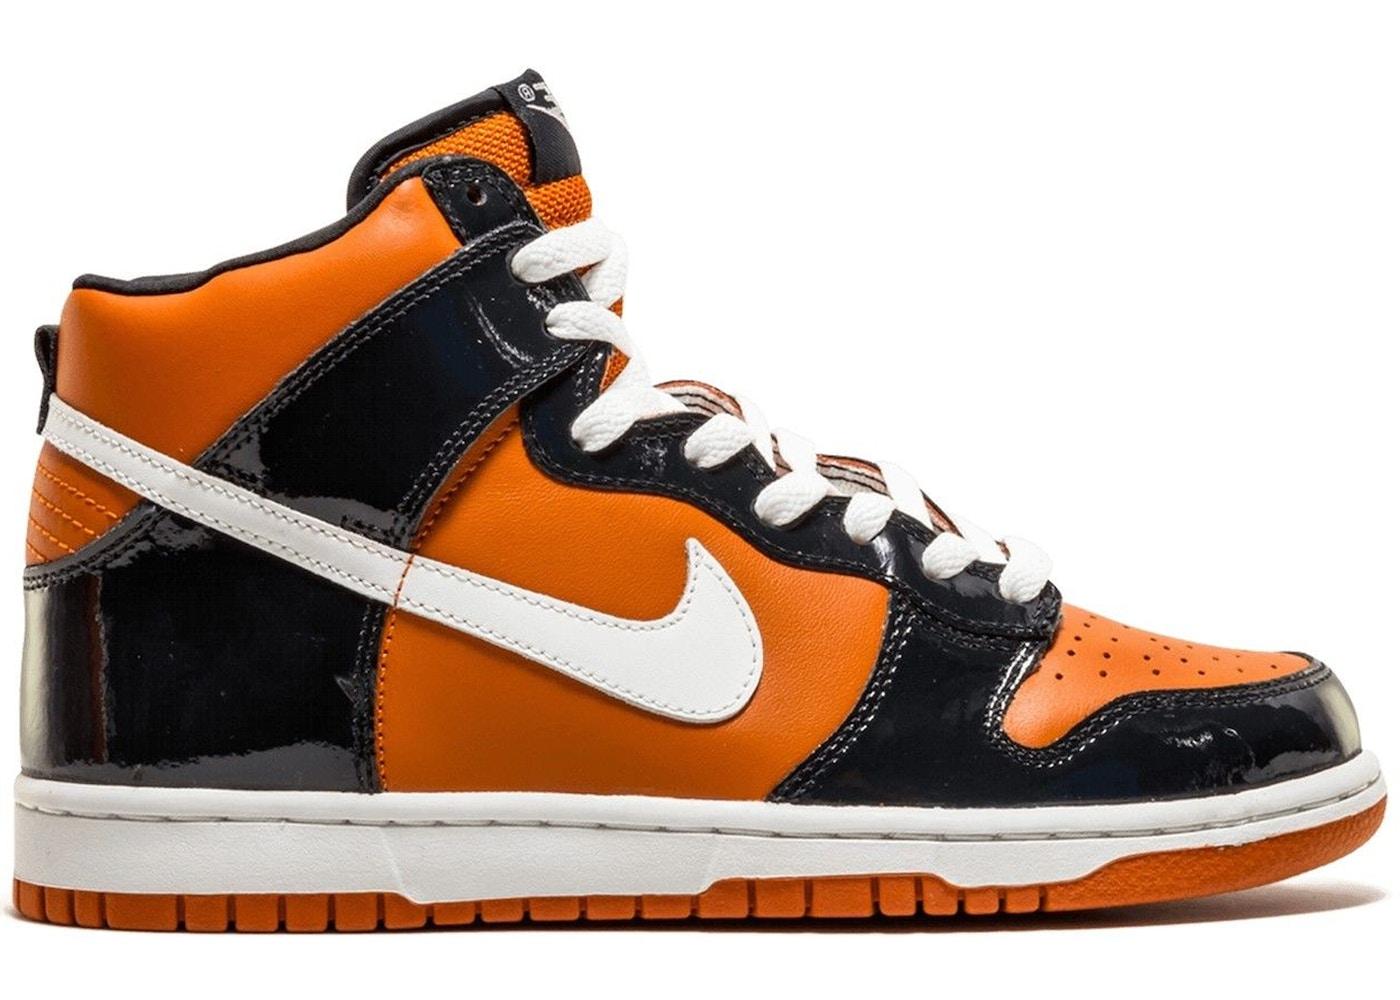 c55bf9d309fa Nike Basketball Dunk Shoes - New Highest Bids